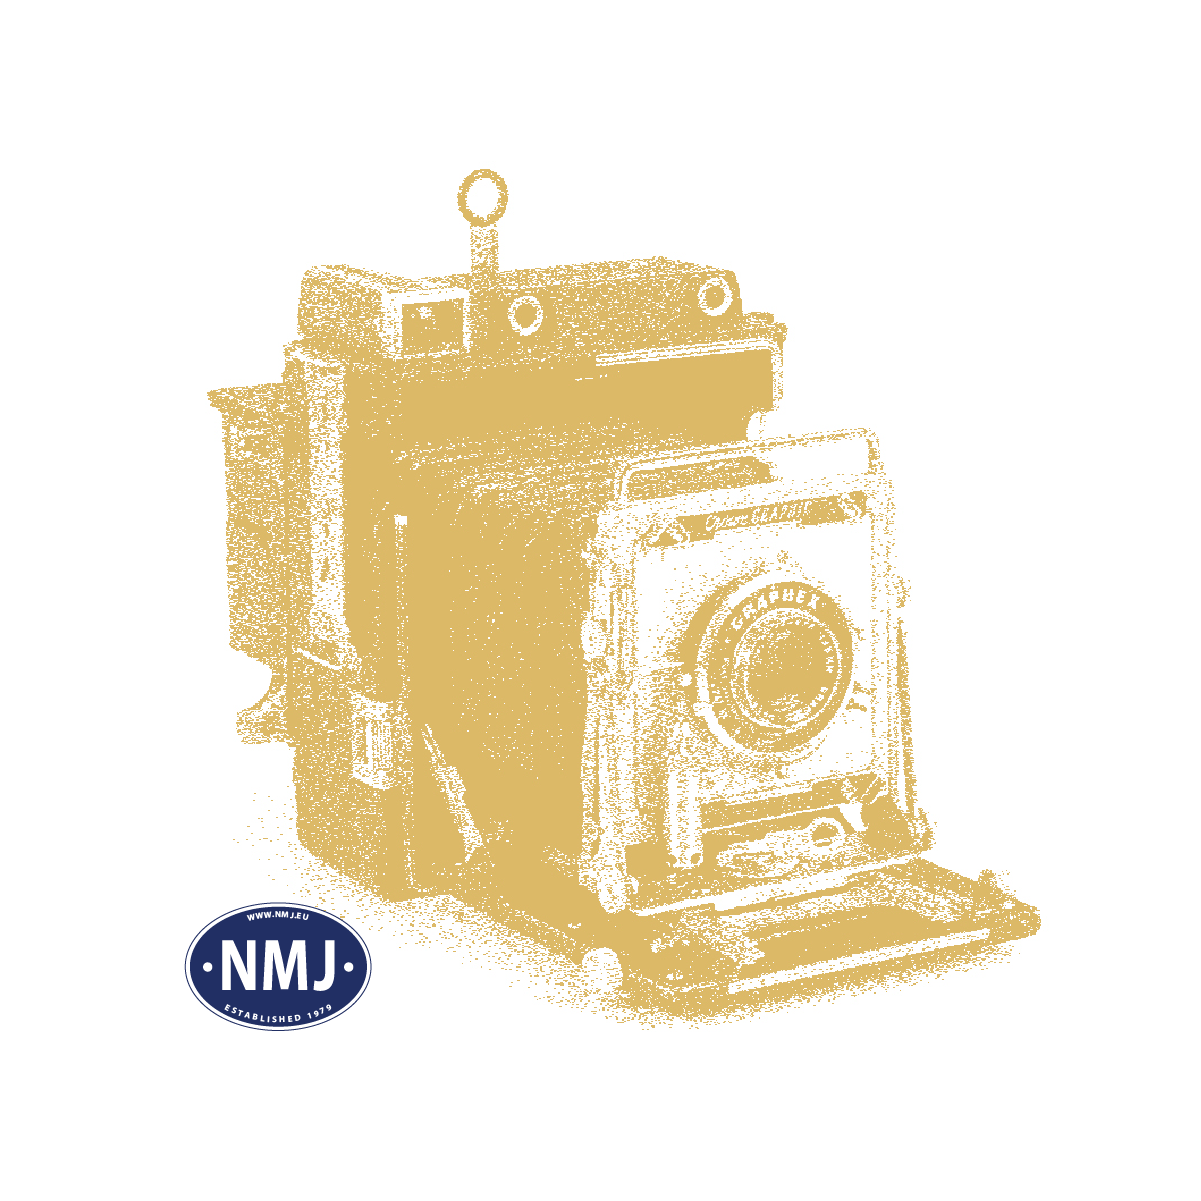 NMJT83.311 - NMJ Topline CargoNet Skd 224.213, Rød/gul, DCC Digital